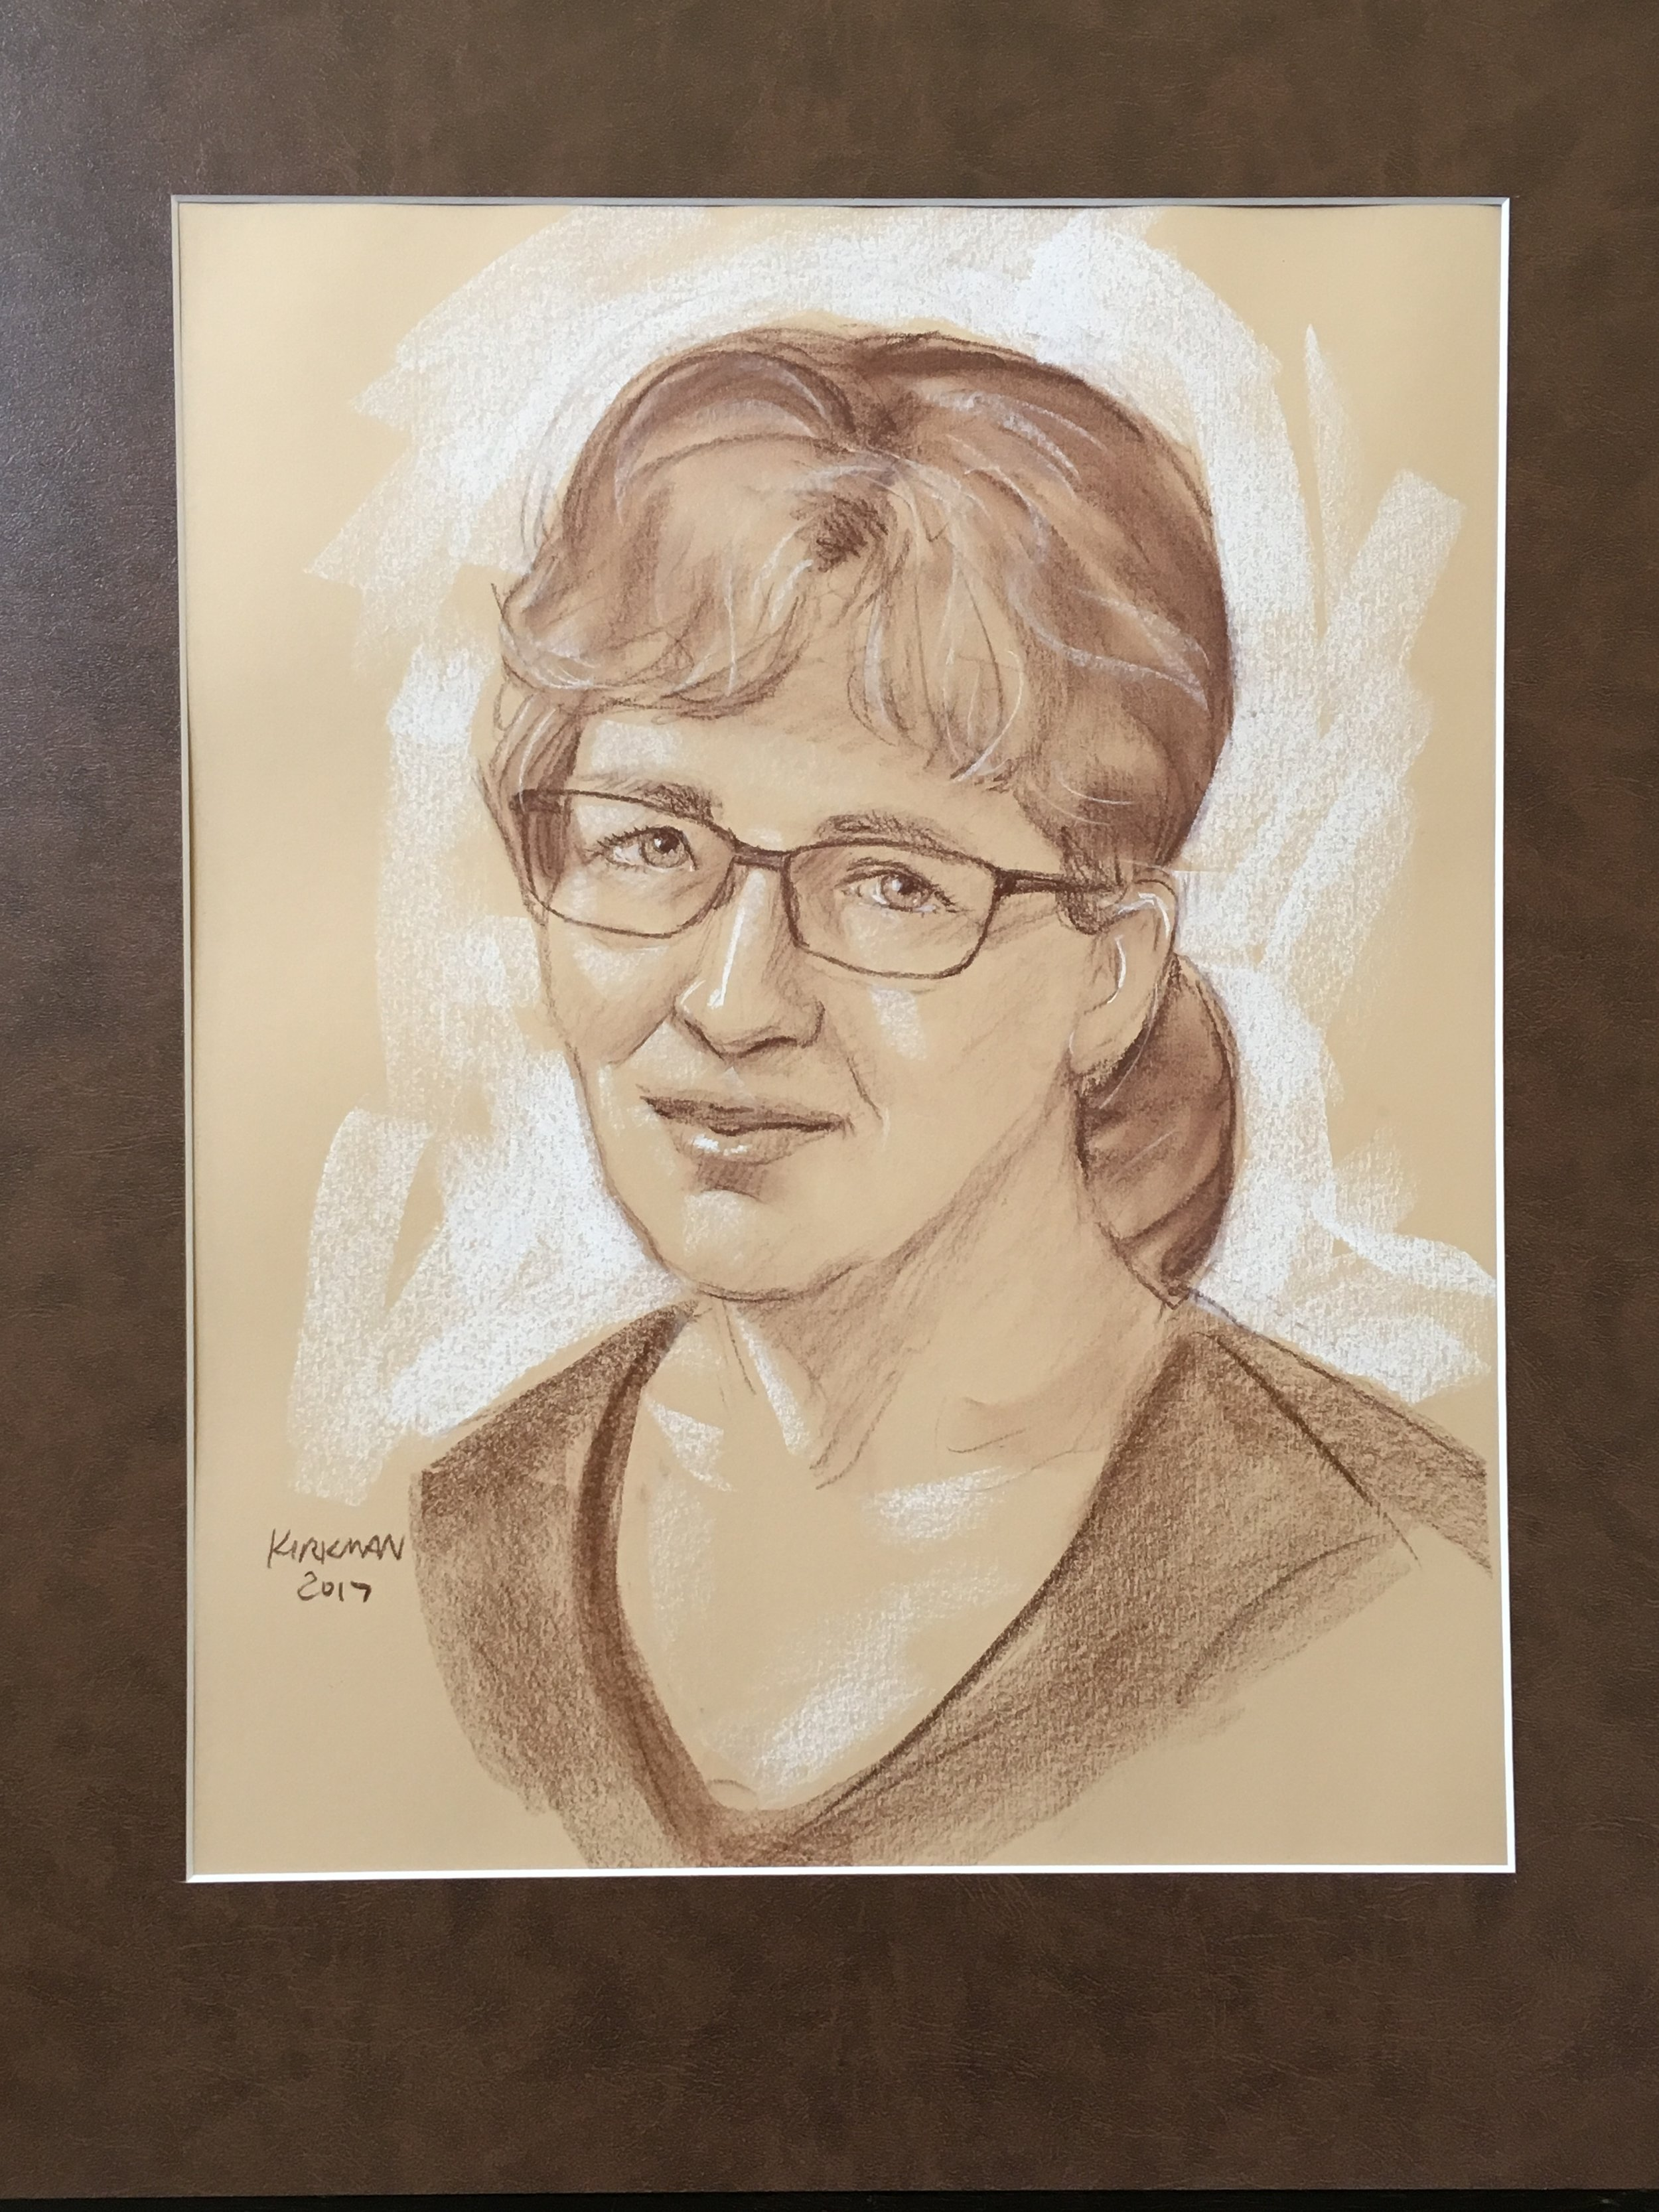 Brody-Kirkman-2017-portrait.JPG